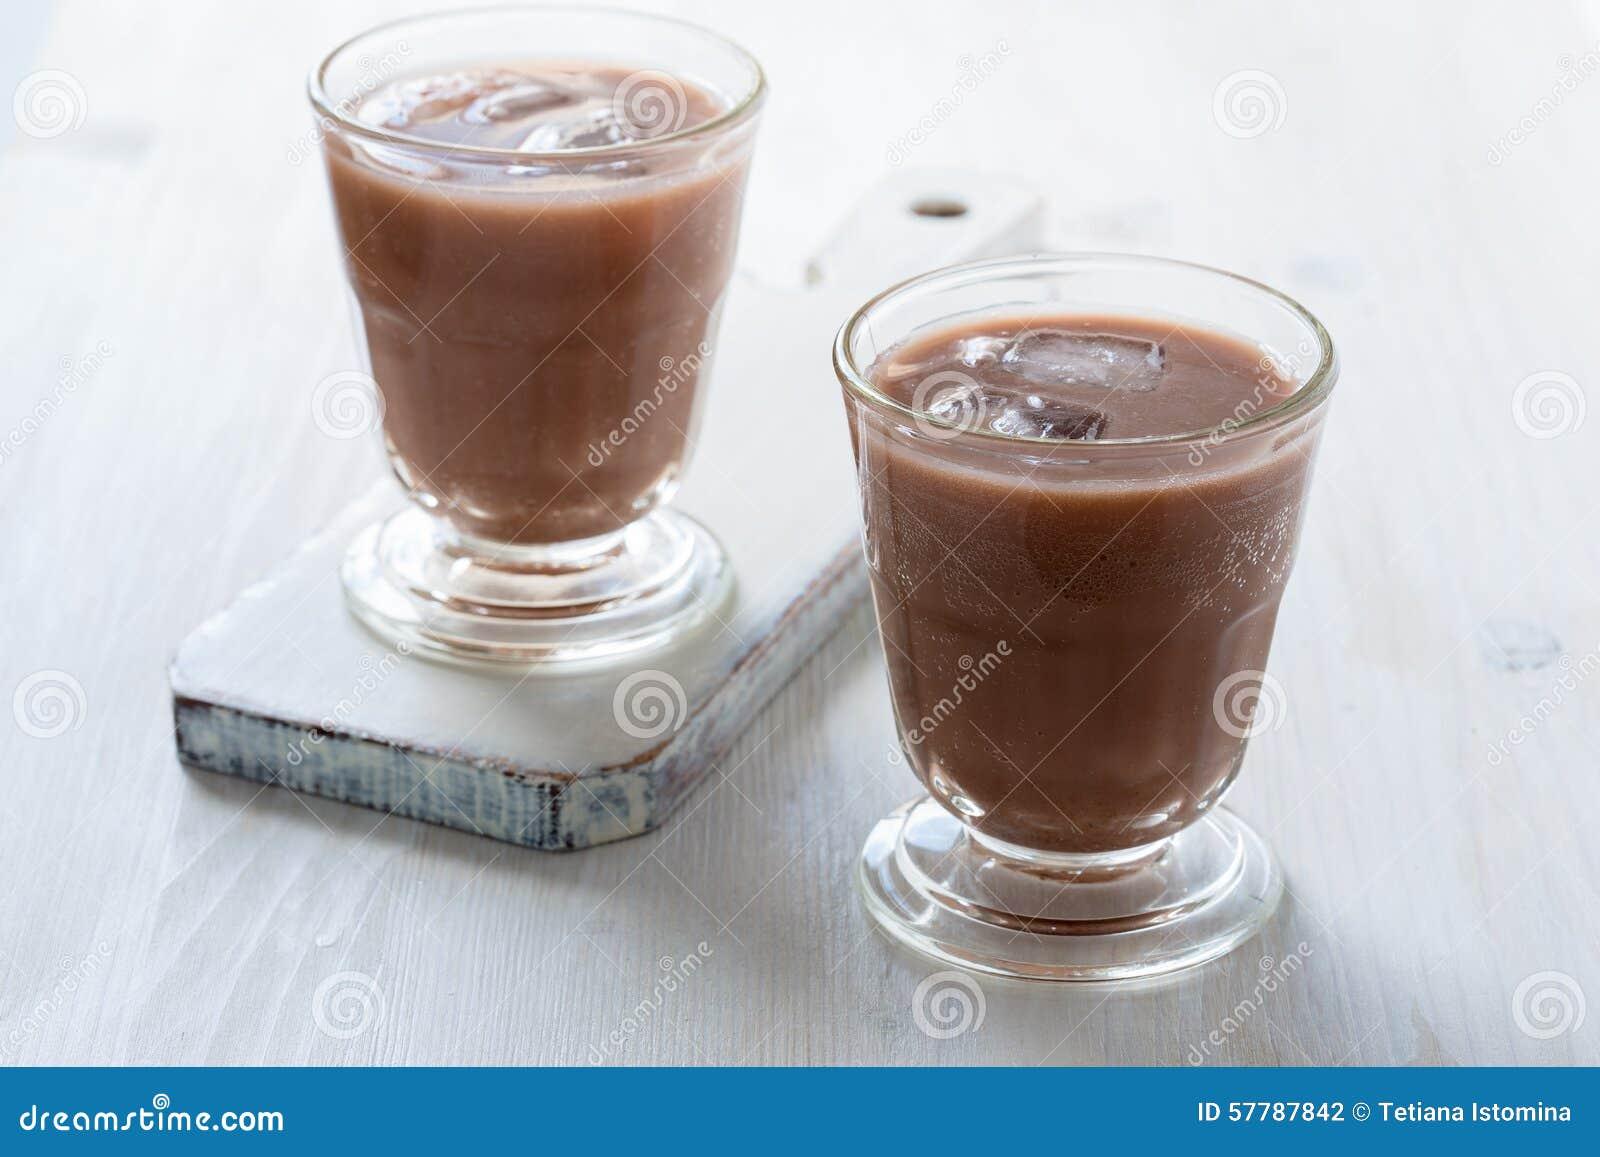 Homemade Chocolate Egg Cream With Milk, Soda Water And Chocolate ...